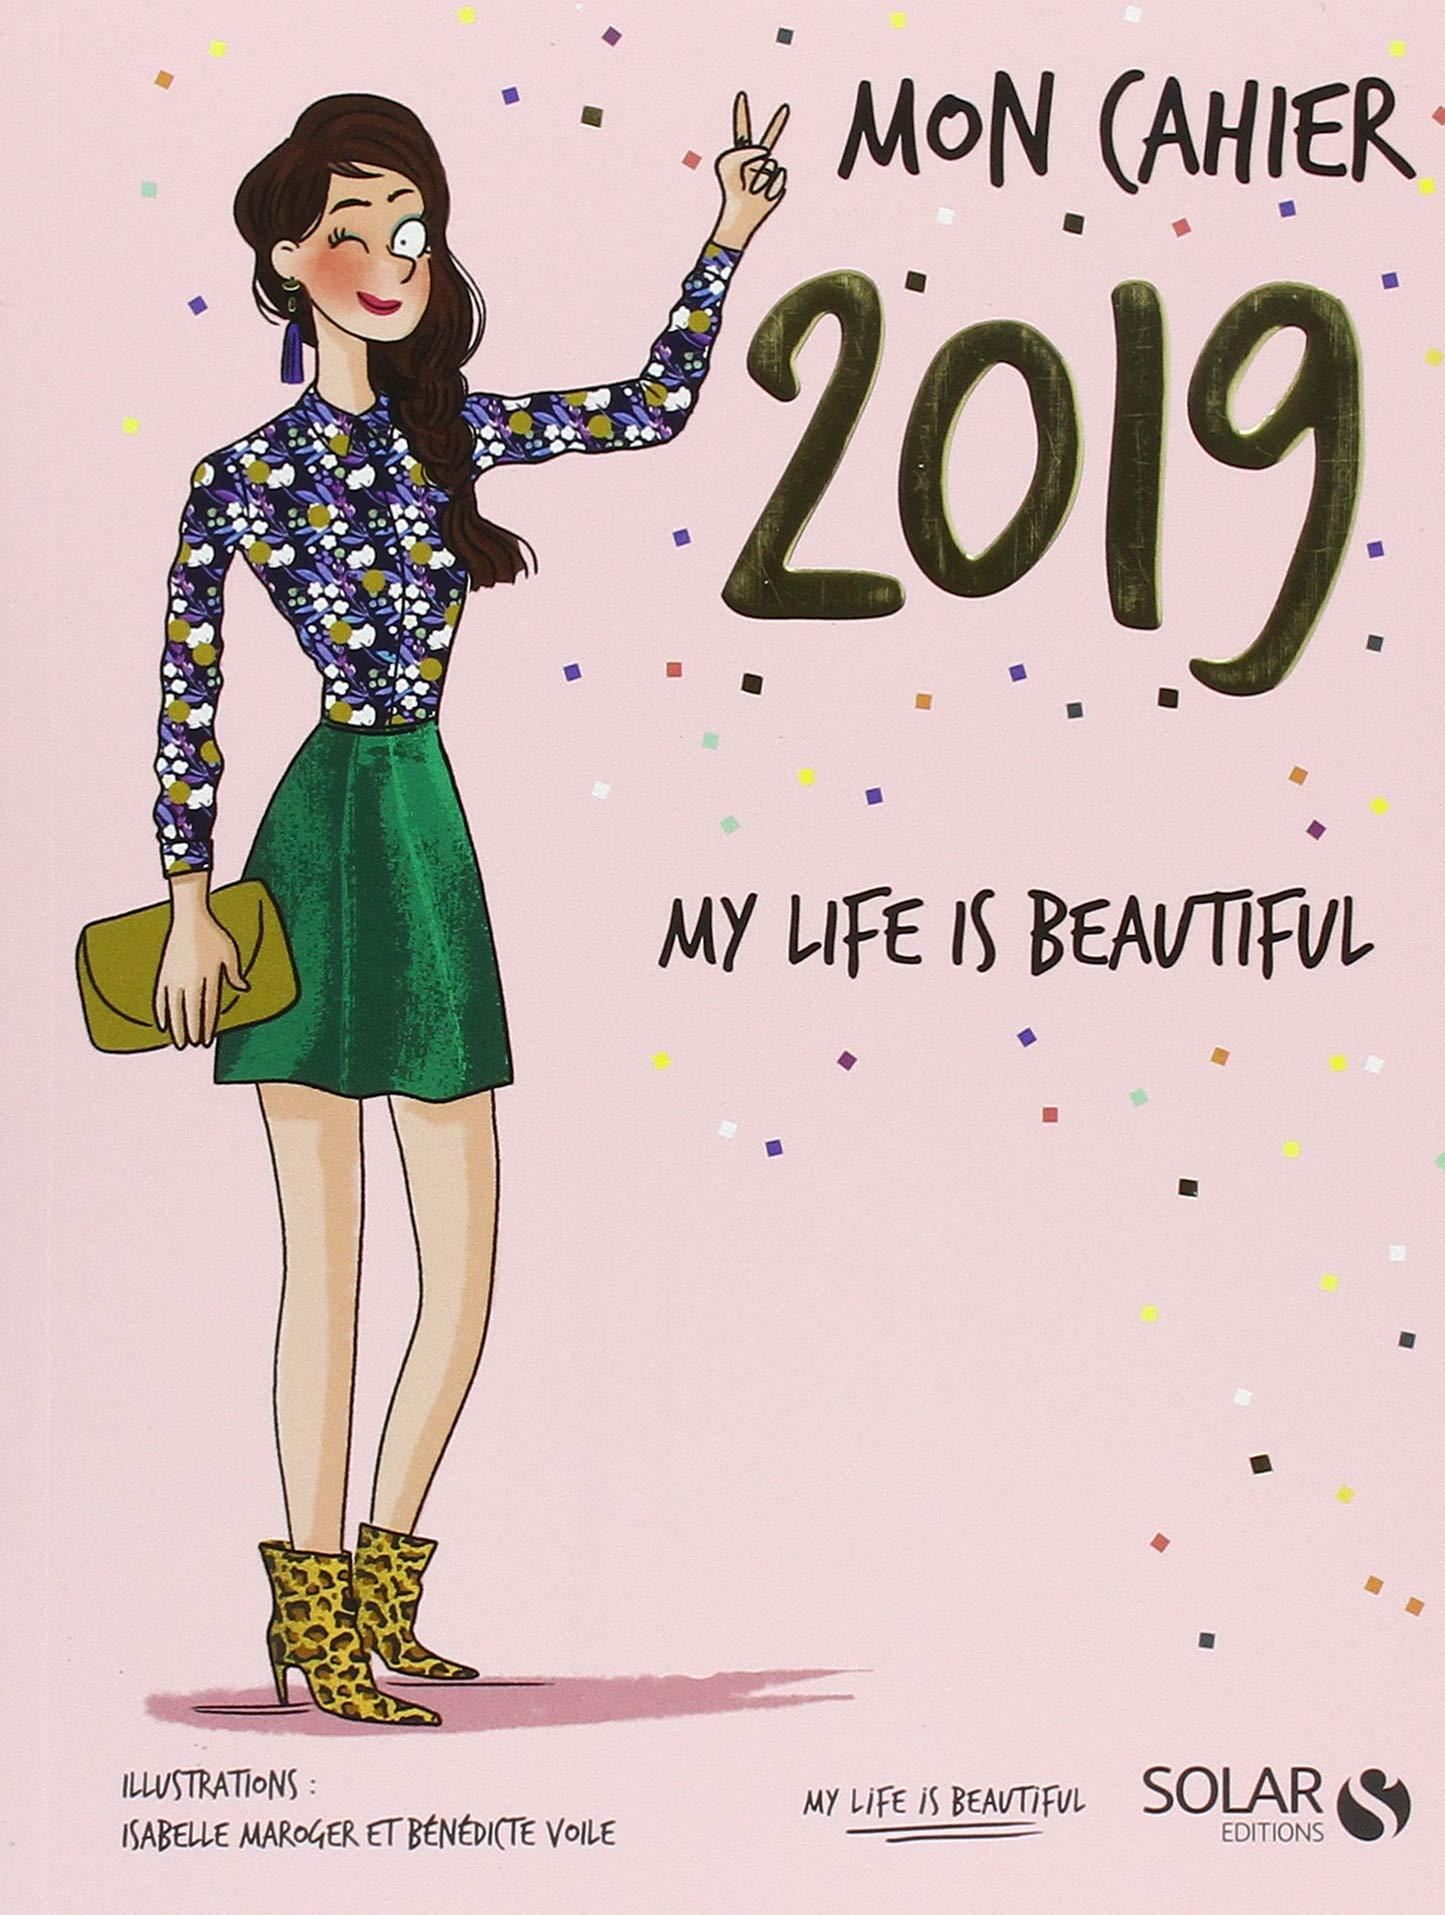 Mon cahier 2019 My life is beautiful Broché – 4 octobre 2018 COLLECTIF Isabelle MAROGER Bénédicte VOILE Solar